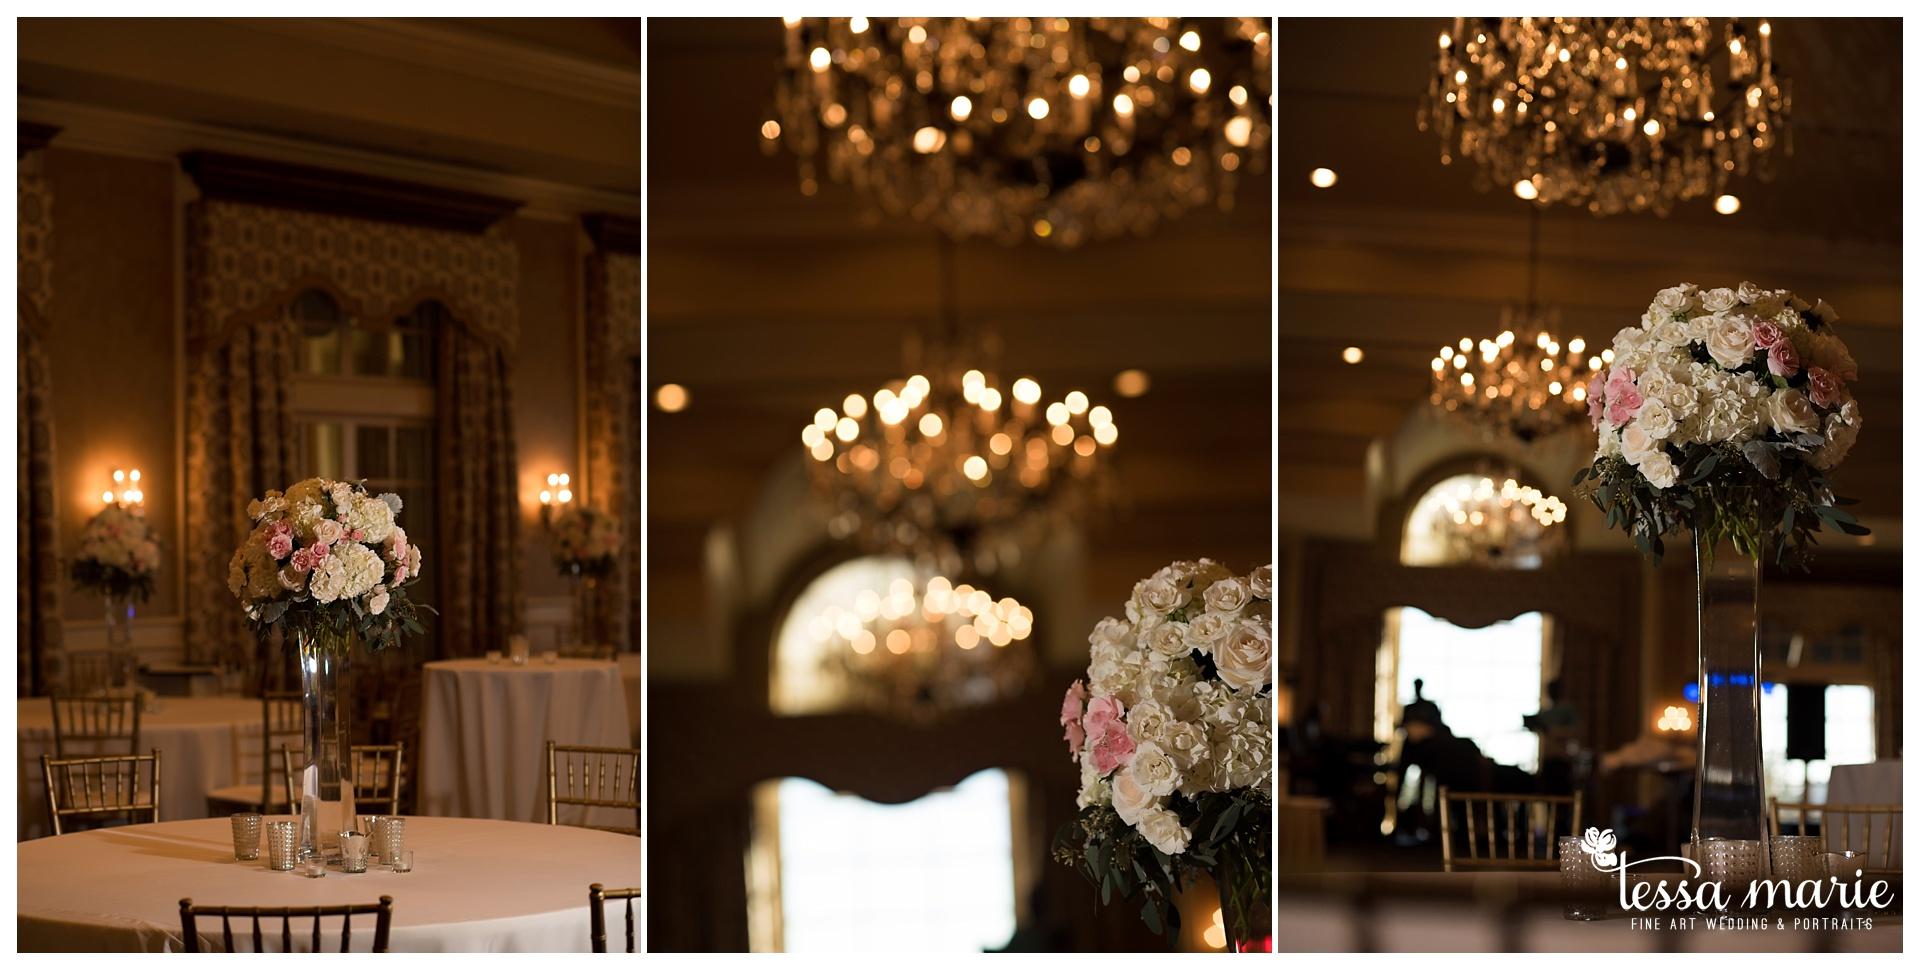 tessa_marie_weddings_legacy_story_focused_wedding_pictures_atlanta_wedding_photographer_0139